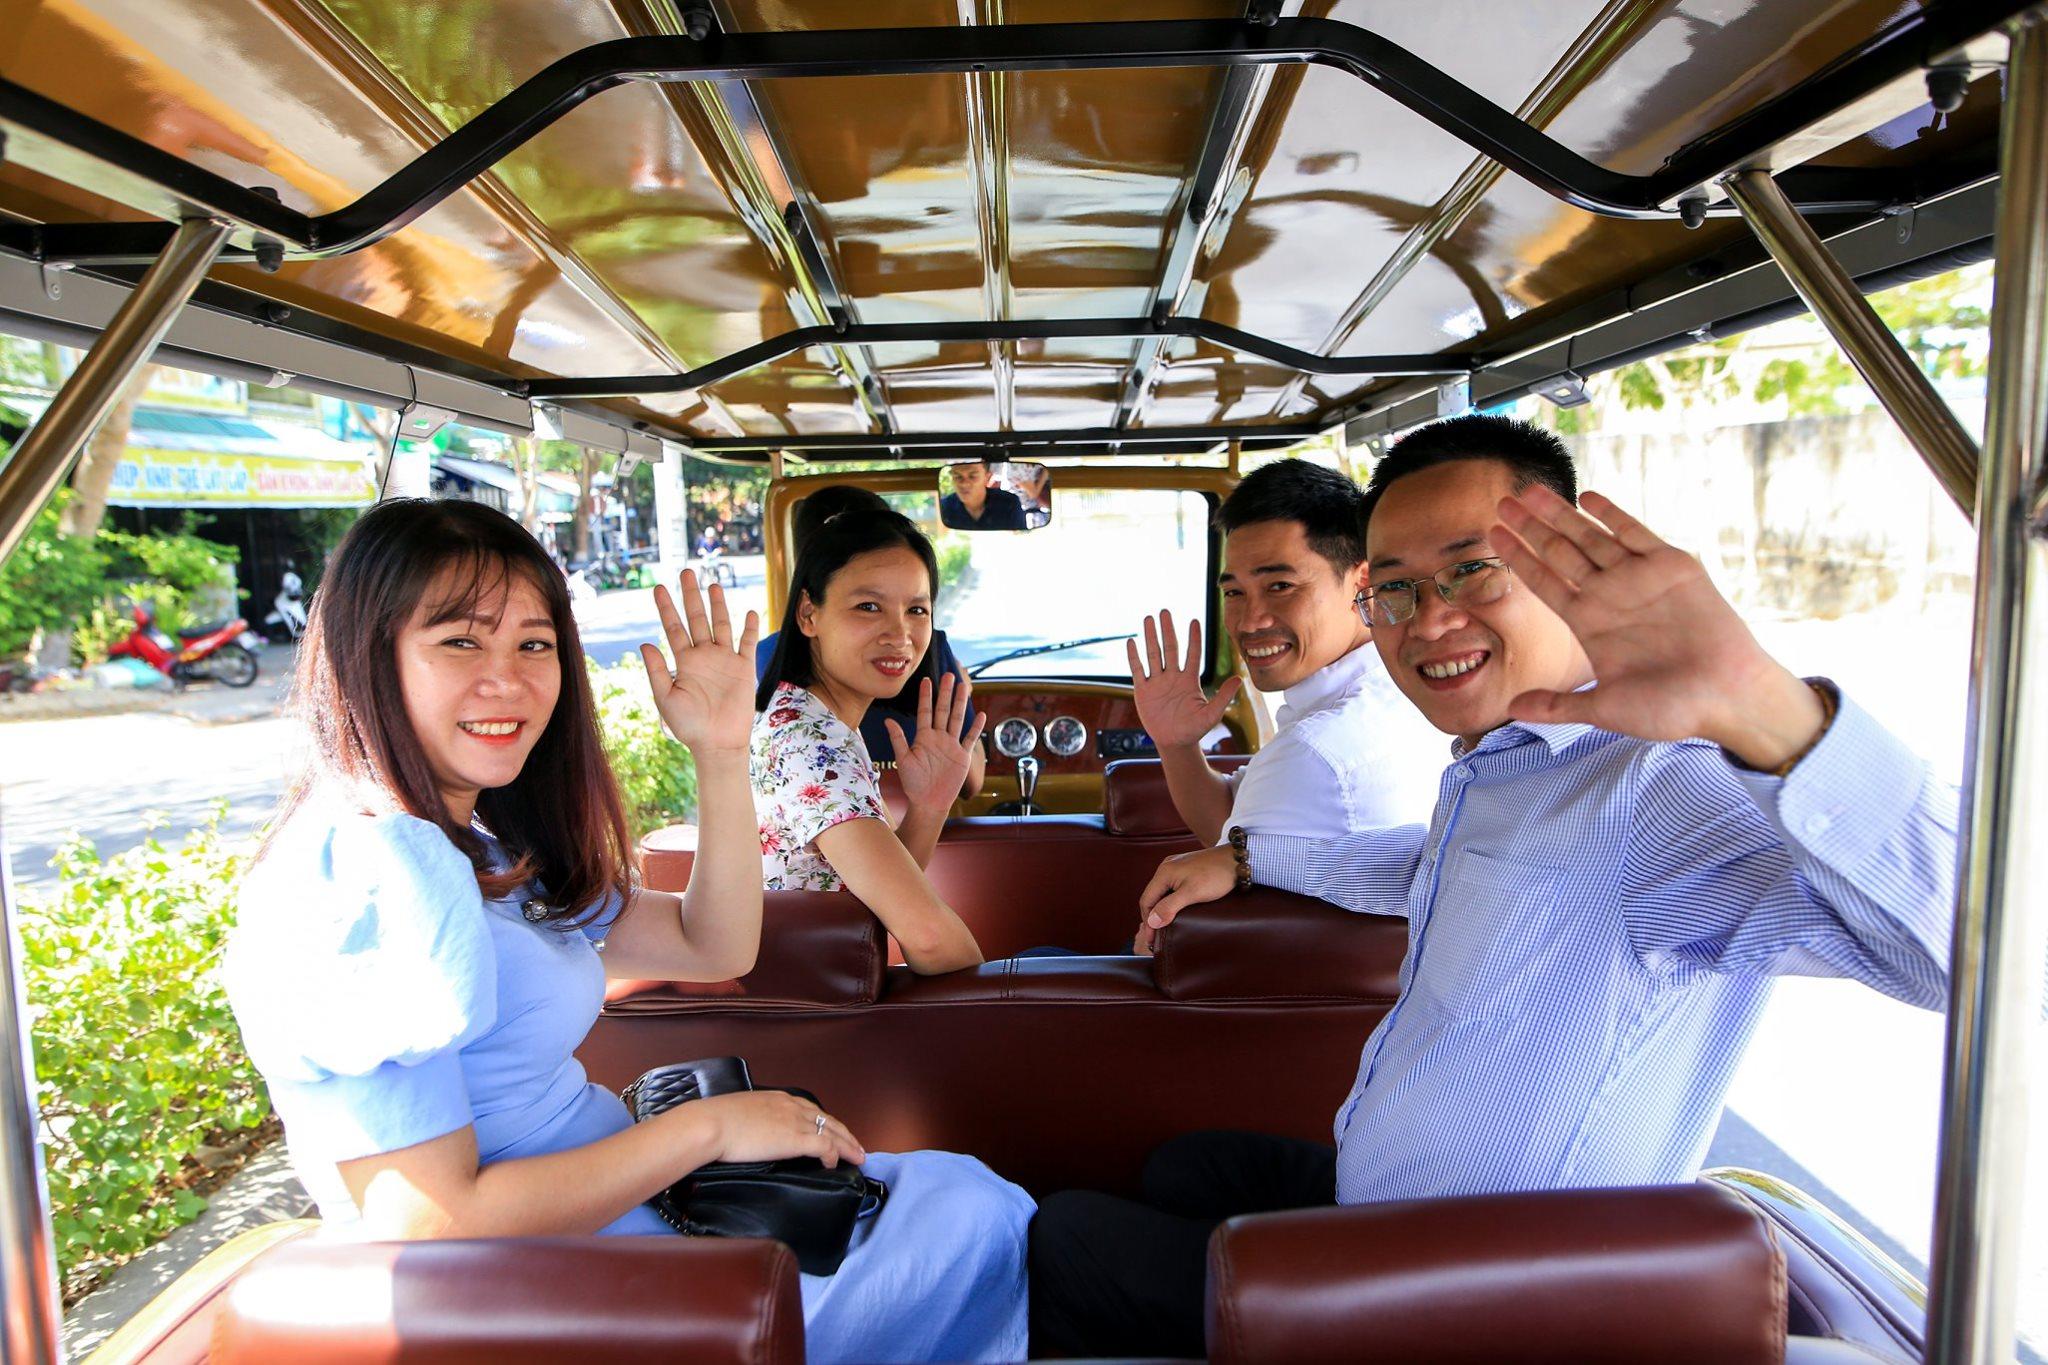 Hoi An Shuttle Bus - Private Shuttle Bus in Hoi An. Happy Customers